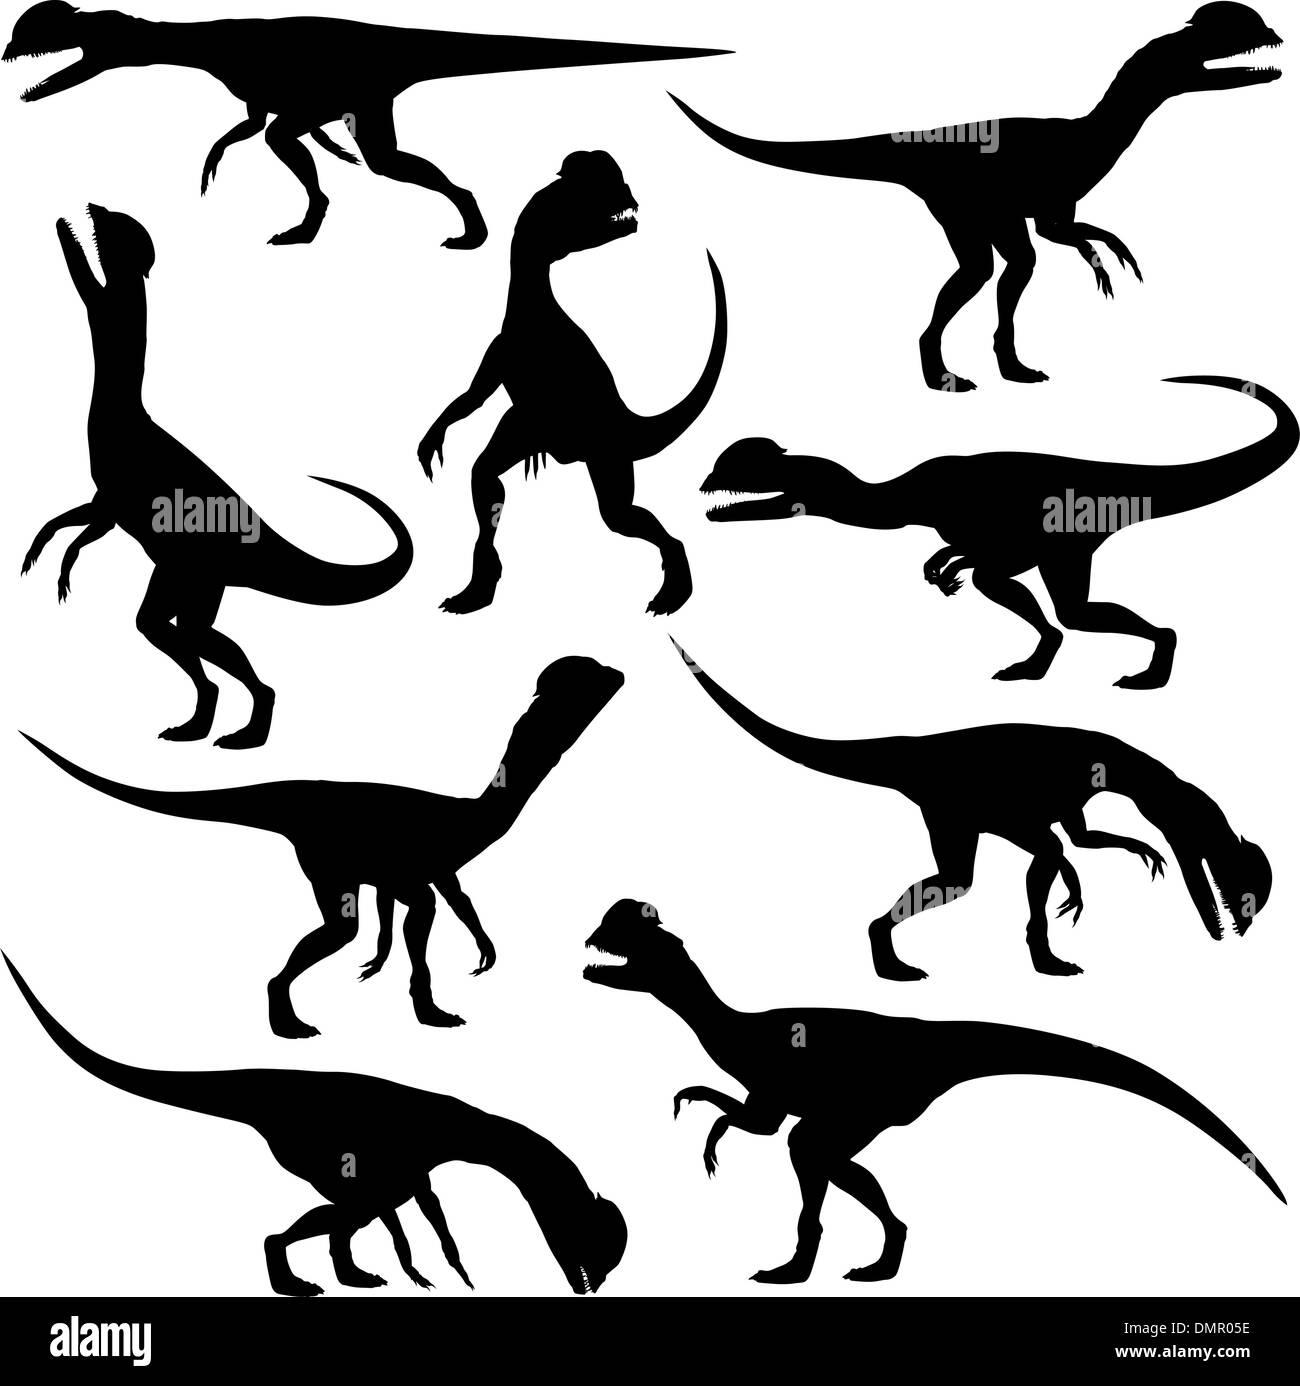 Dilophosaurus dinosaur - Stock Image